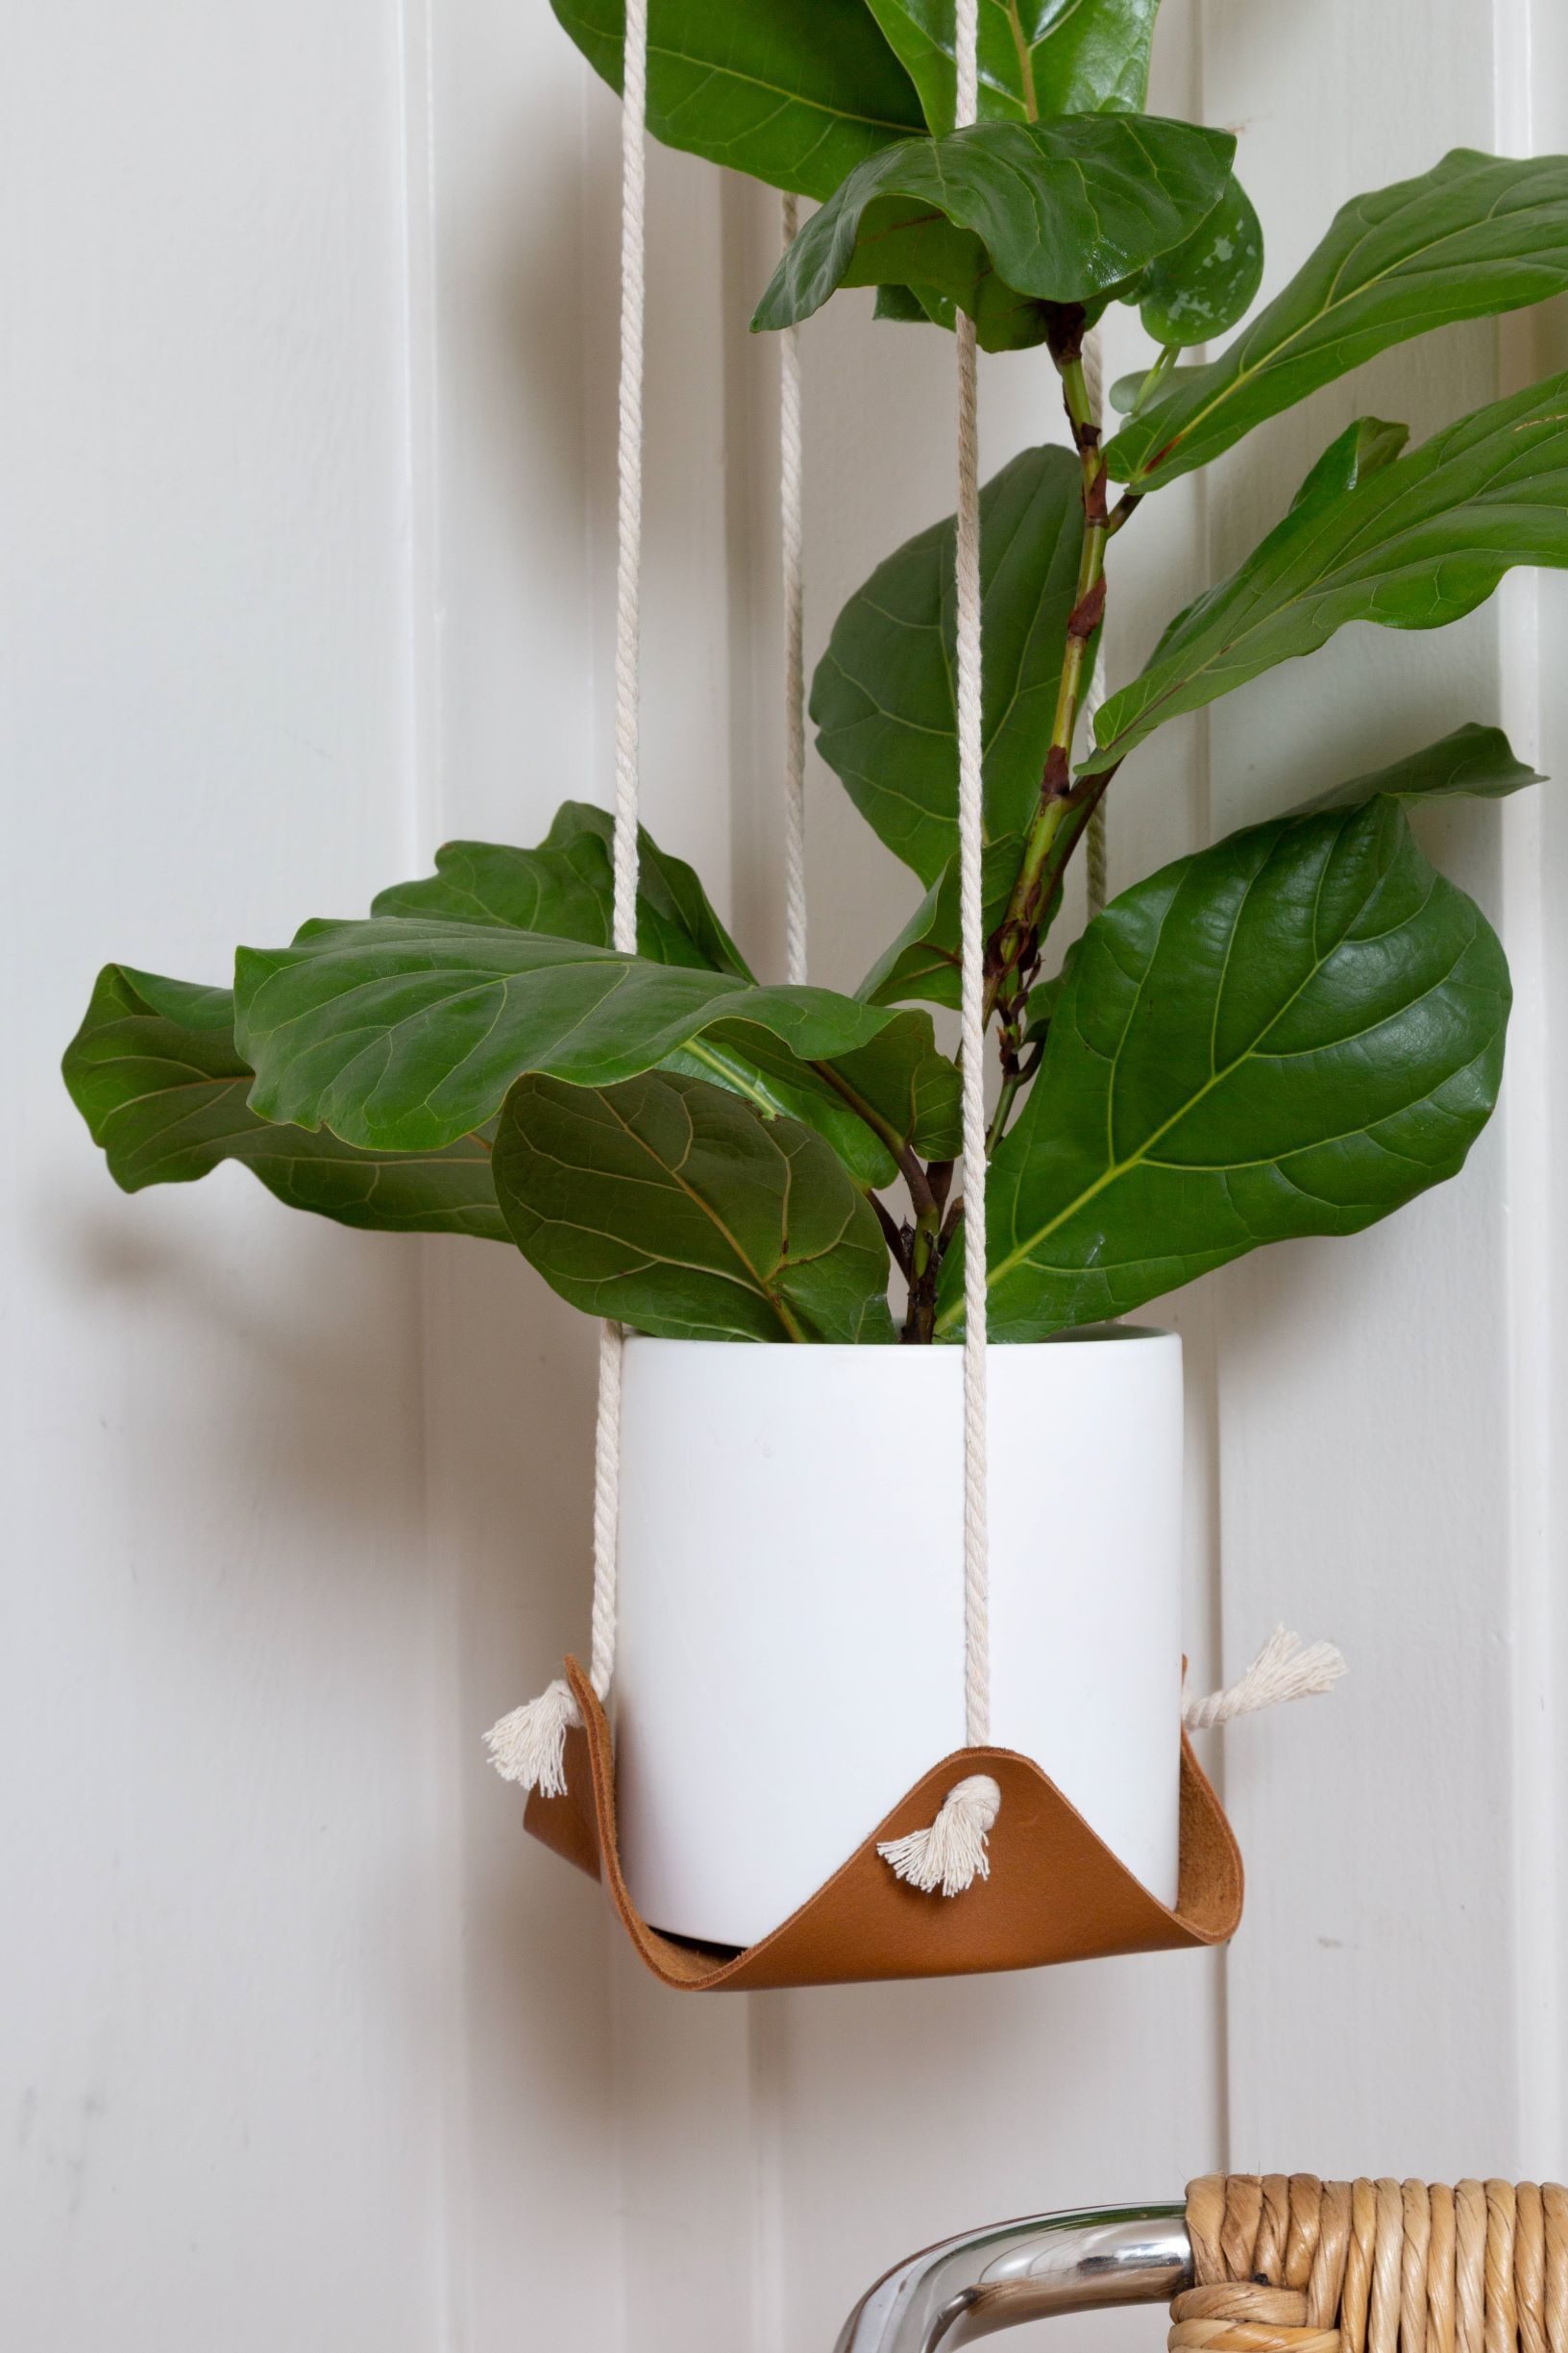 Double Leather Plant Hammock - Large [8.5 x 8.5] / XL [10 x 10] / Veg Tan